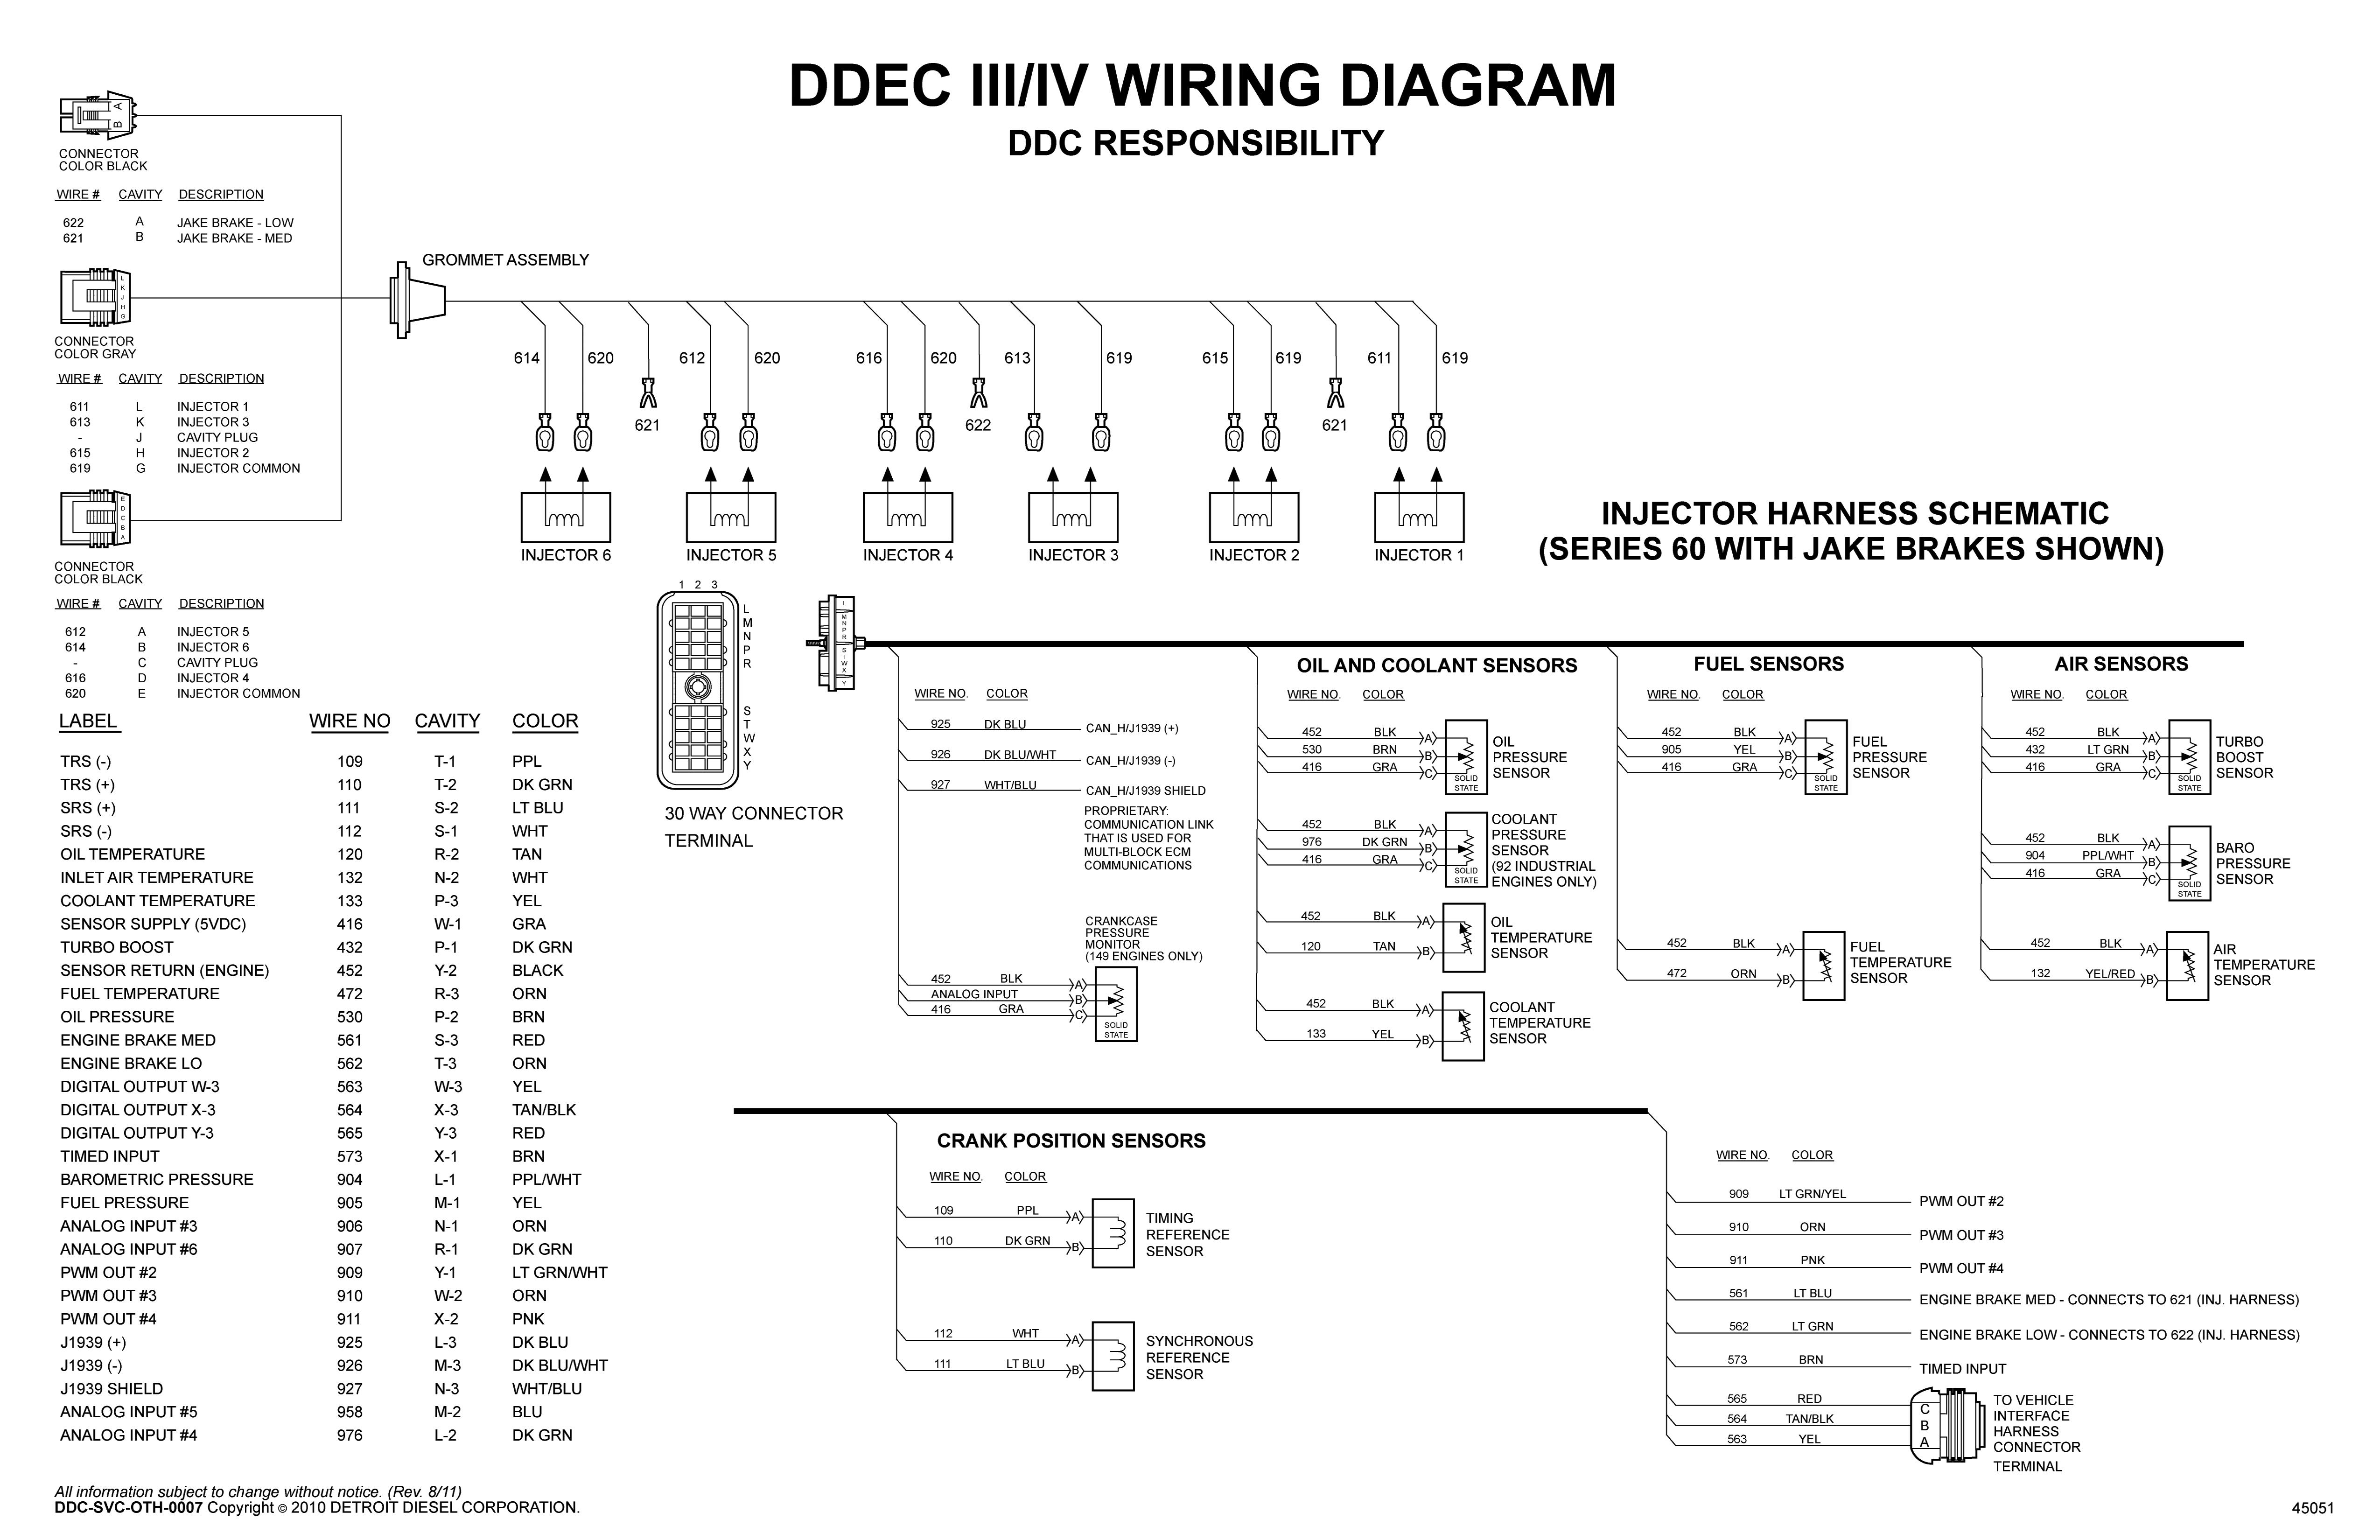 RC_8908] Western Star Truck Wiring Diagram On Sterling Truck Wiring Diagrams  Free DiagramNeph Ospor Wigeg Mill Bepta Xero Viewor Mohammedshrine Librar Wiring 101